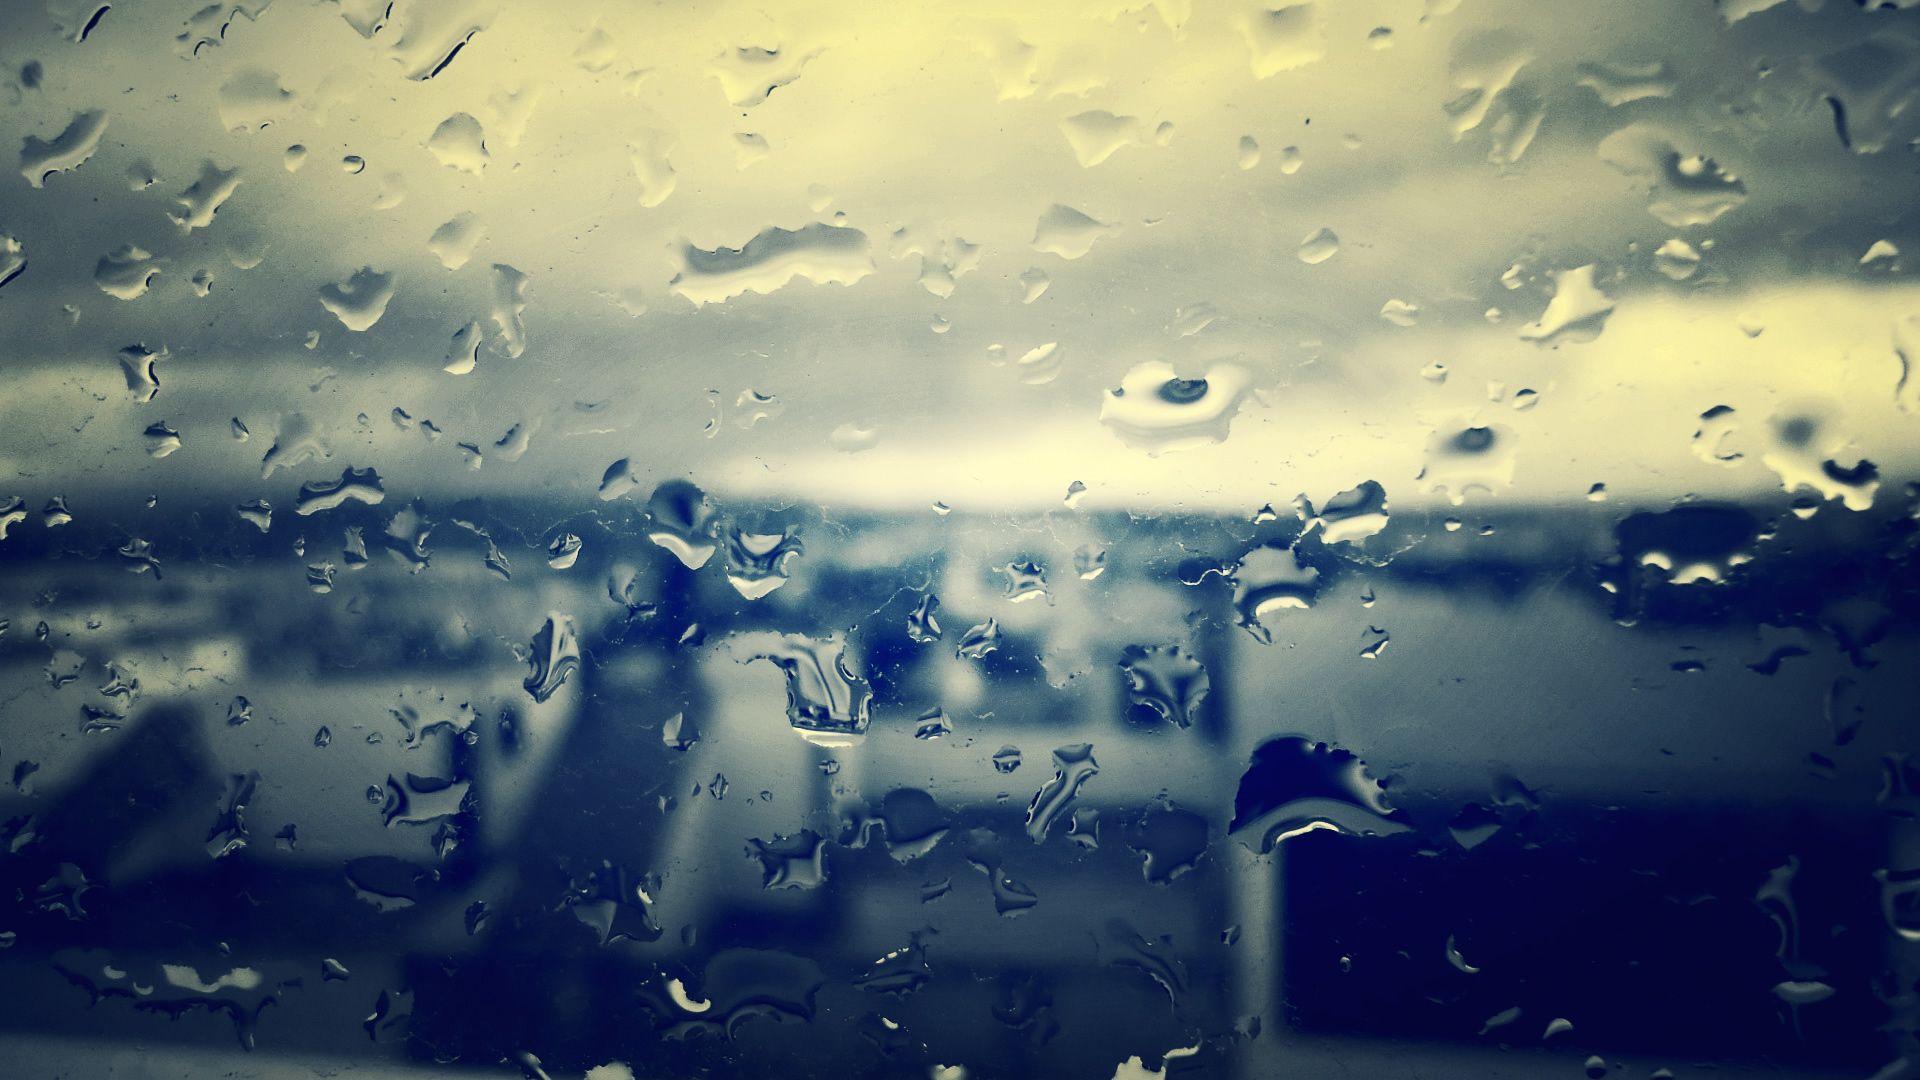 Hd wallpaper rain - Love Couples Romance In The Rain Wallpapers